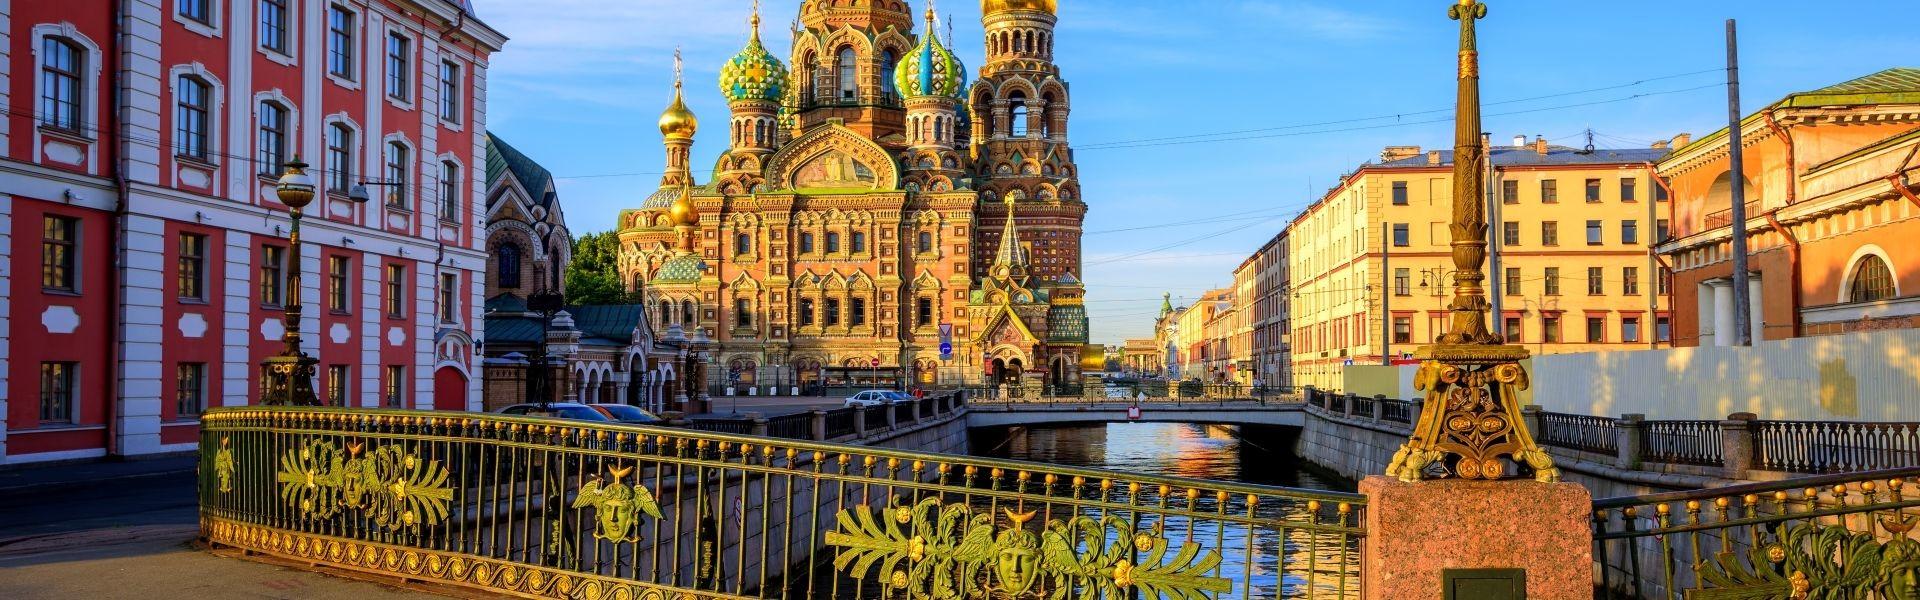 تور سن پترزبورگ + مسکو 14 مرداد 98